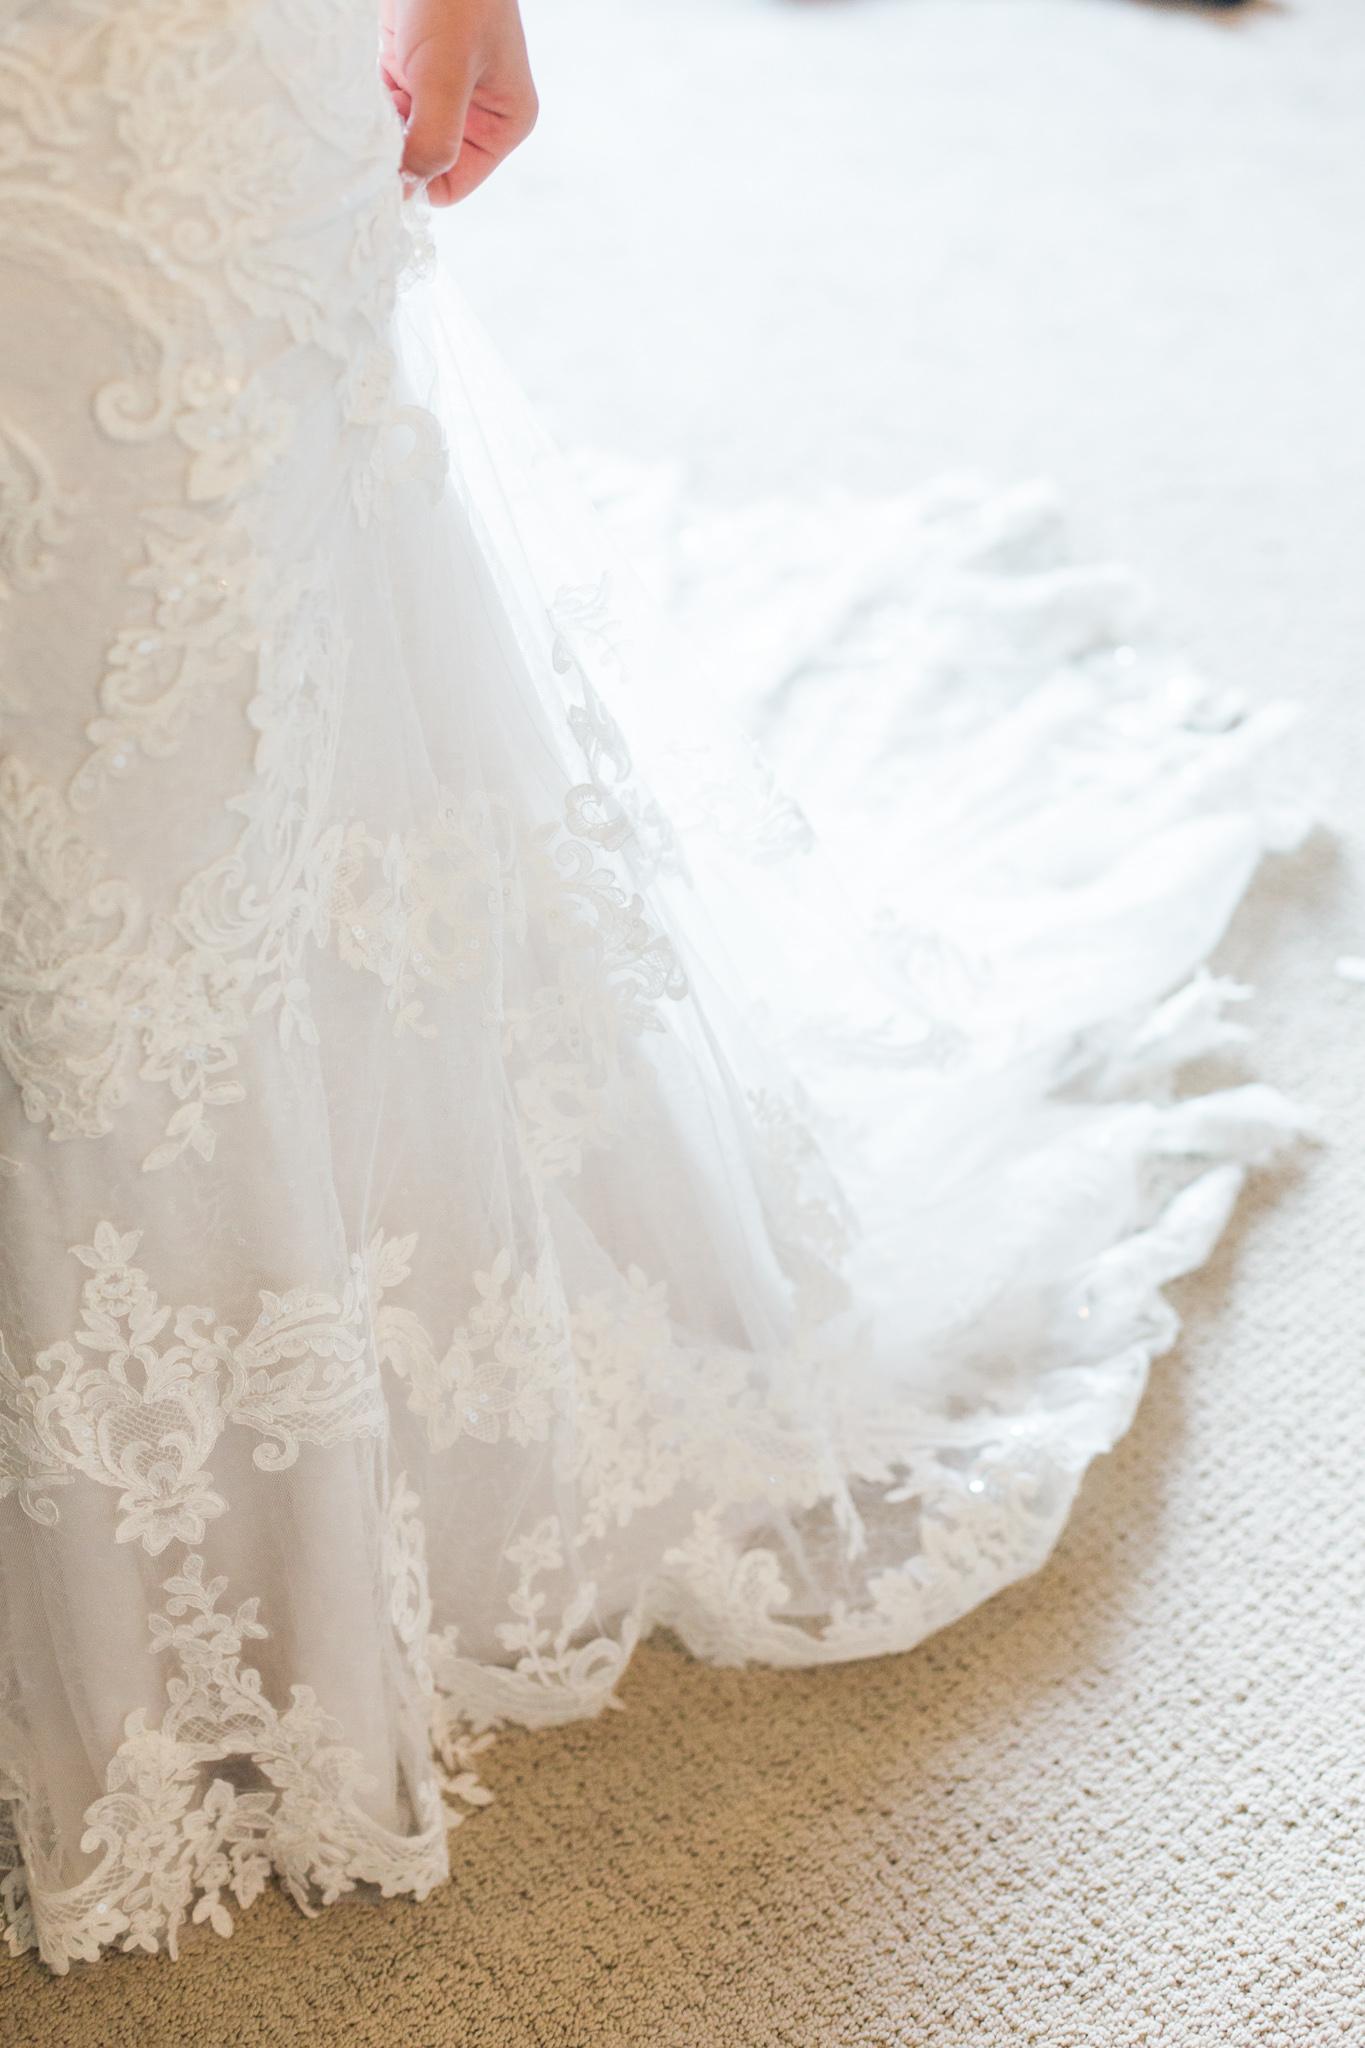 Olga_janni_wedding_090917_WEBSIZE (85 of 704).JPG